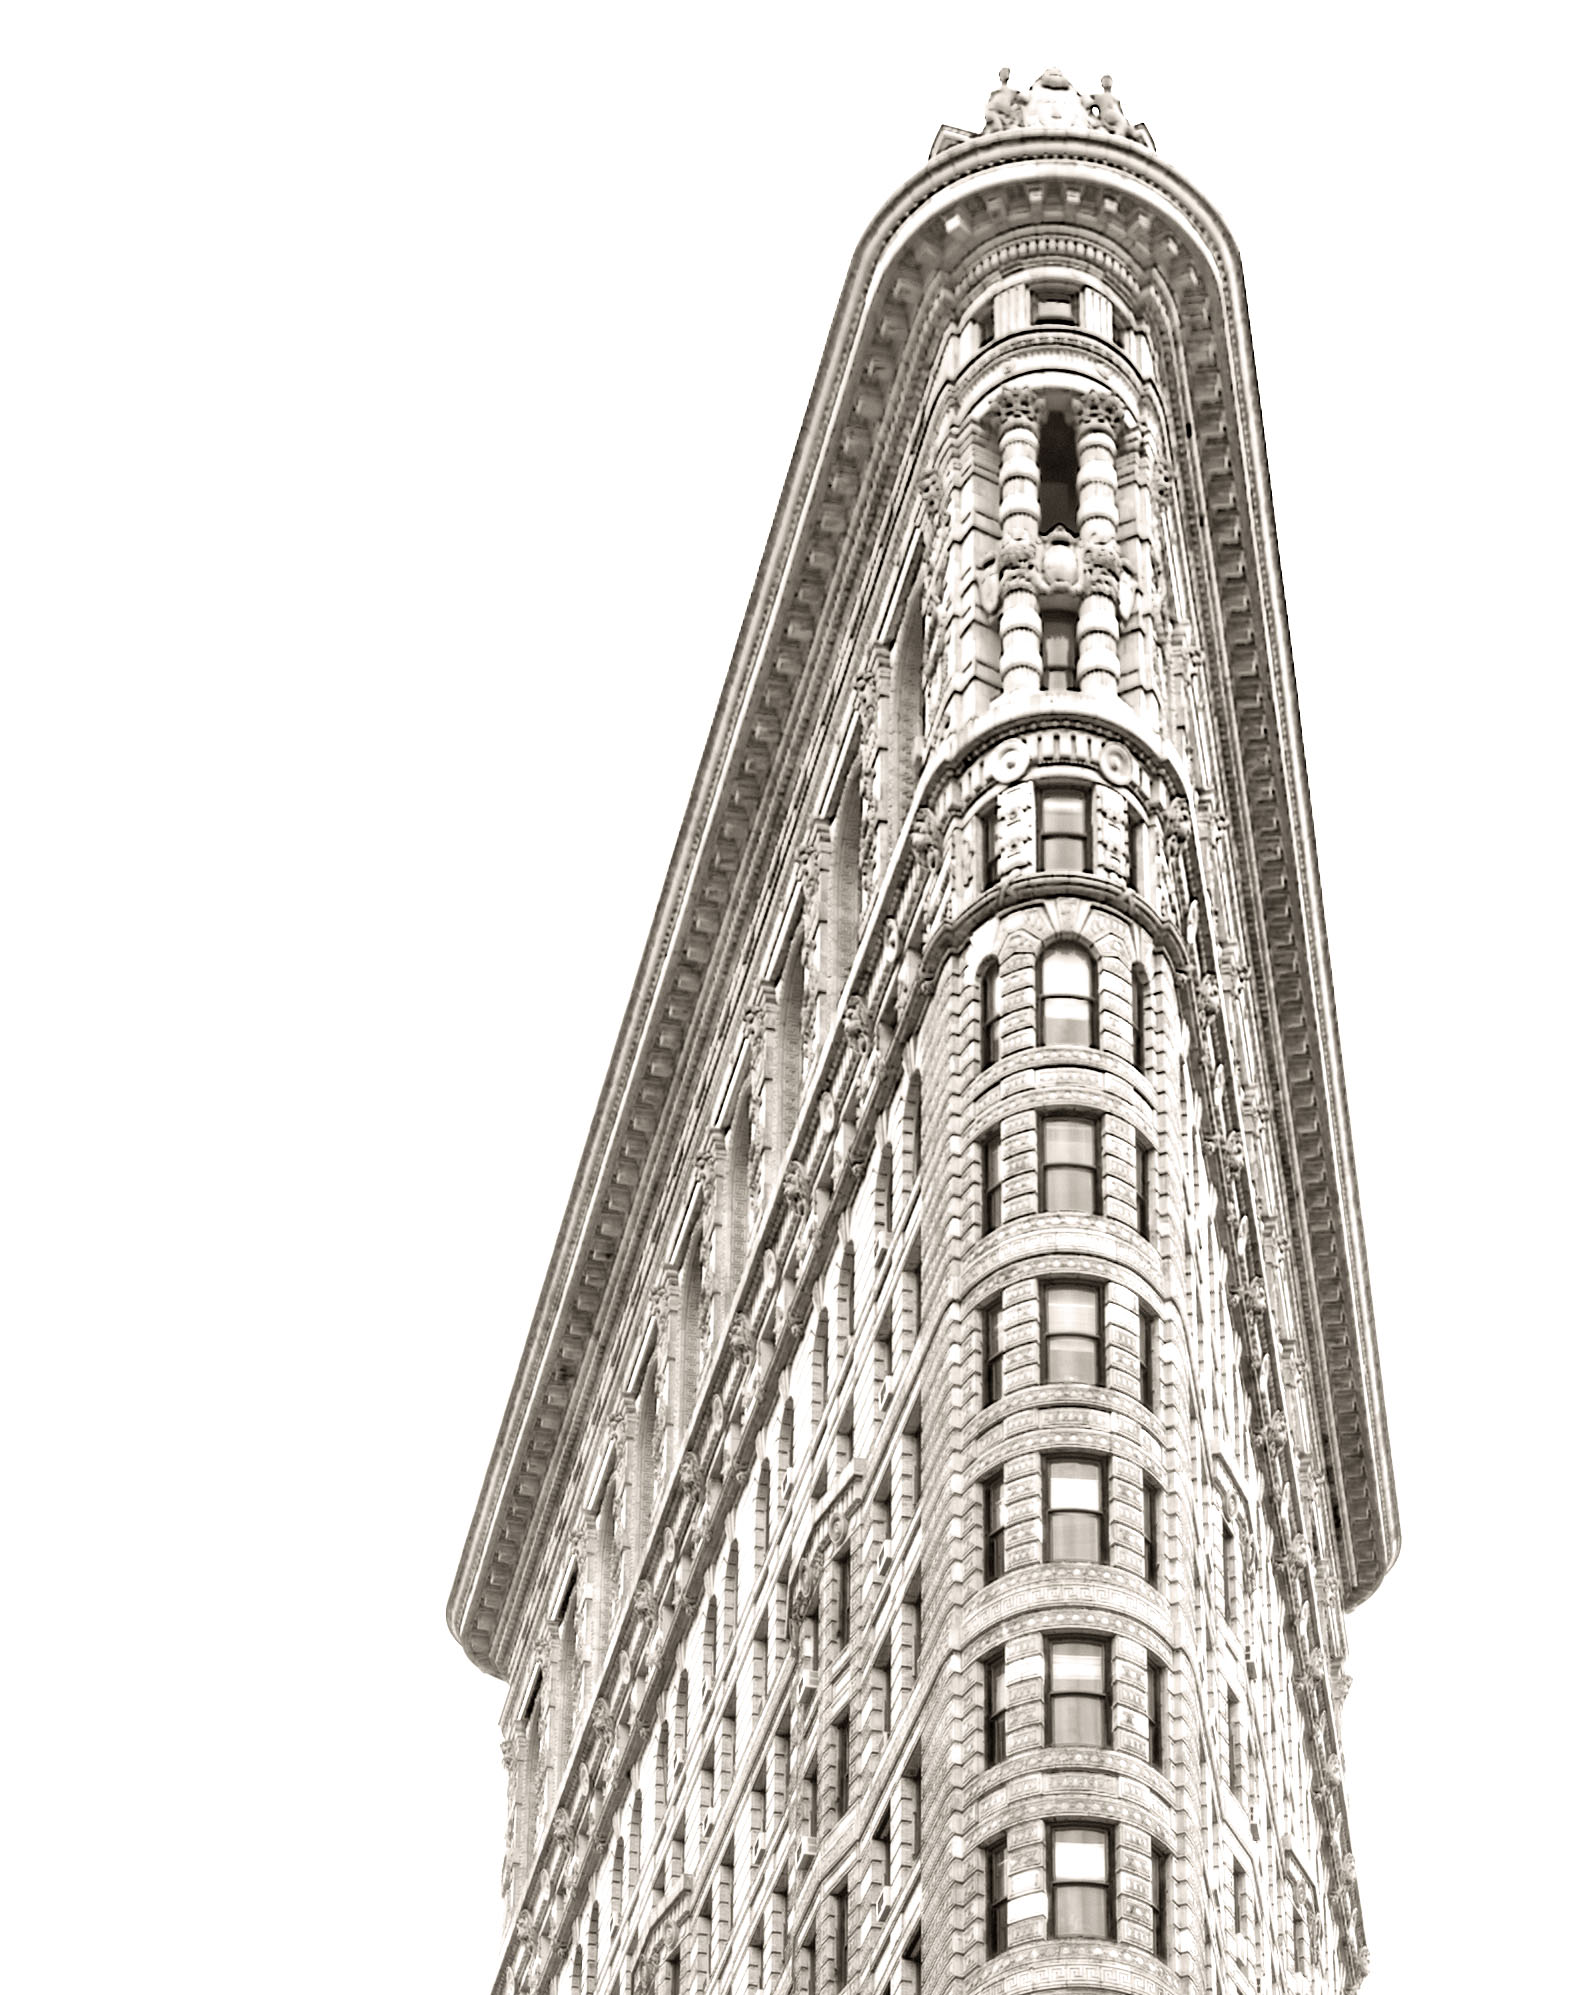 New York Fine Art City Photography Prints For Sale.jpg